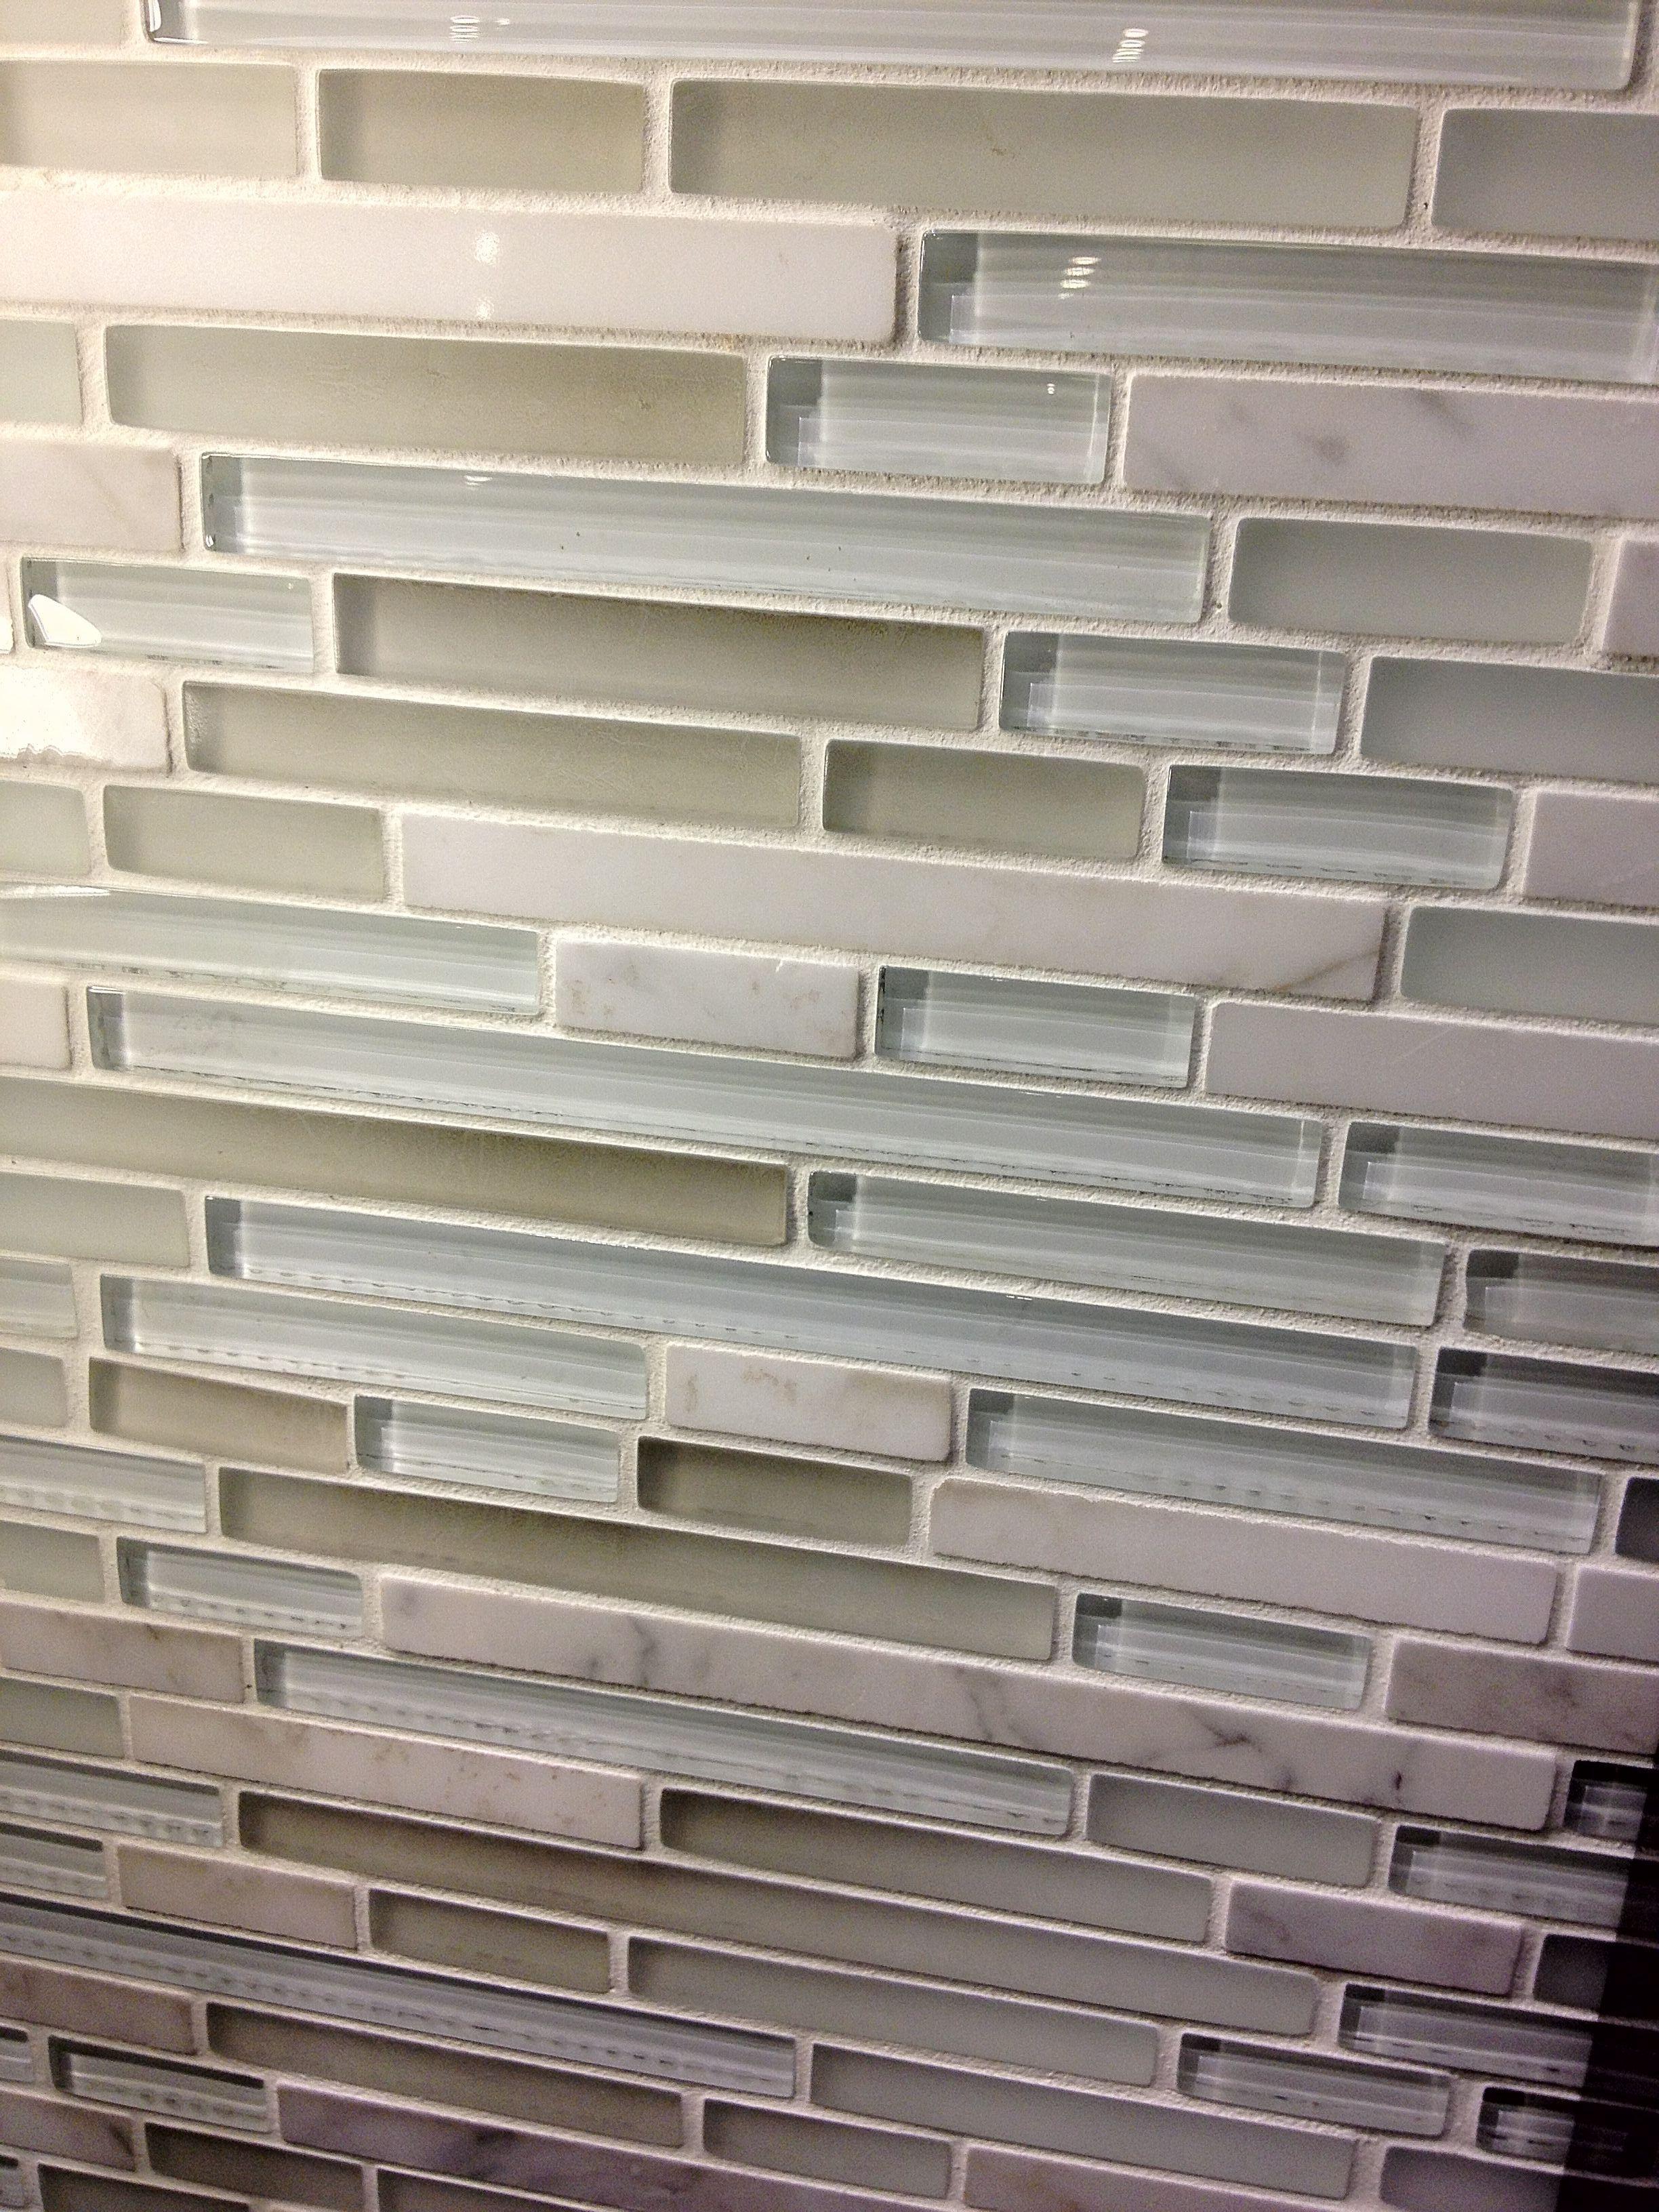 Peachy Kitchen Backsplashes Tiles Tiles Tiles Kitchen Complete Home Design Collection Barbaintelli Responsecom